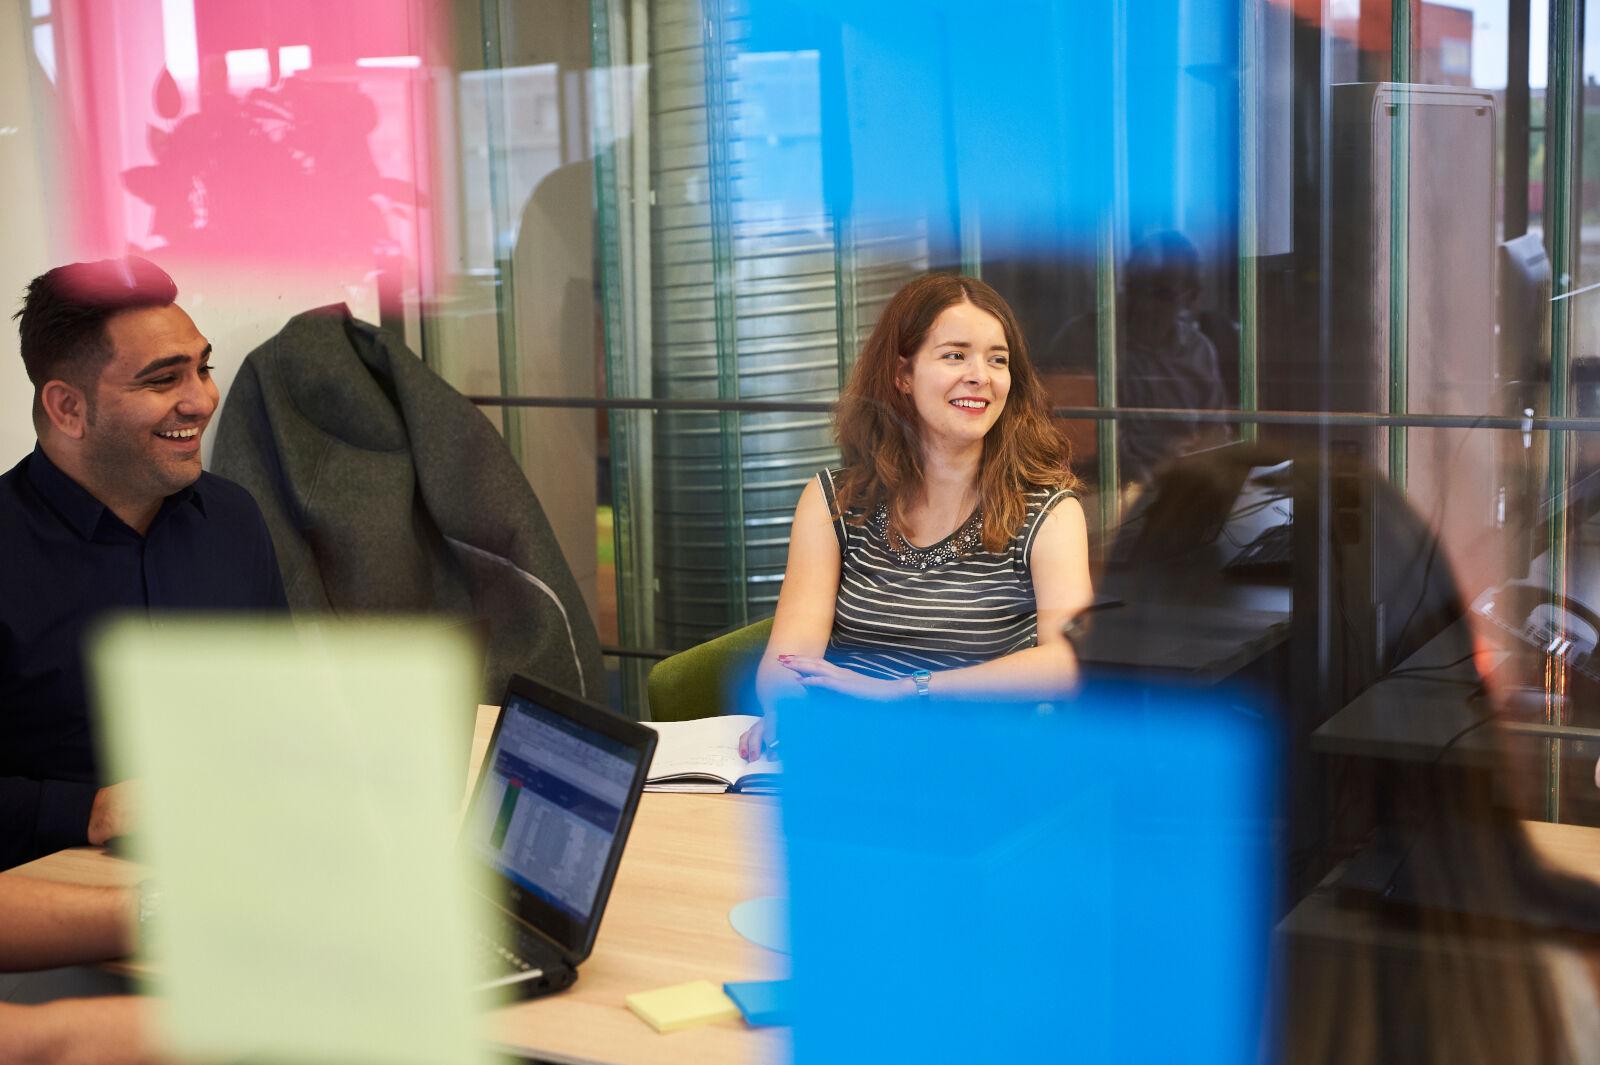 SAP ABAP Entwickler (m/w/d) - Job Bremen, Homeoffice - Jobs | team neusta Karriereportal